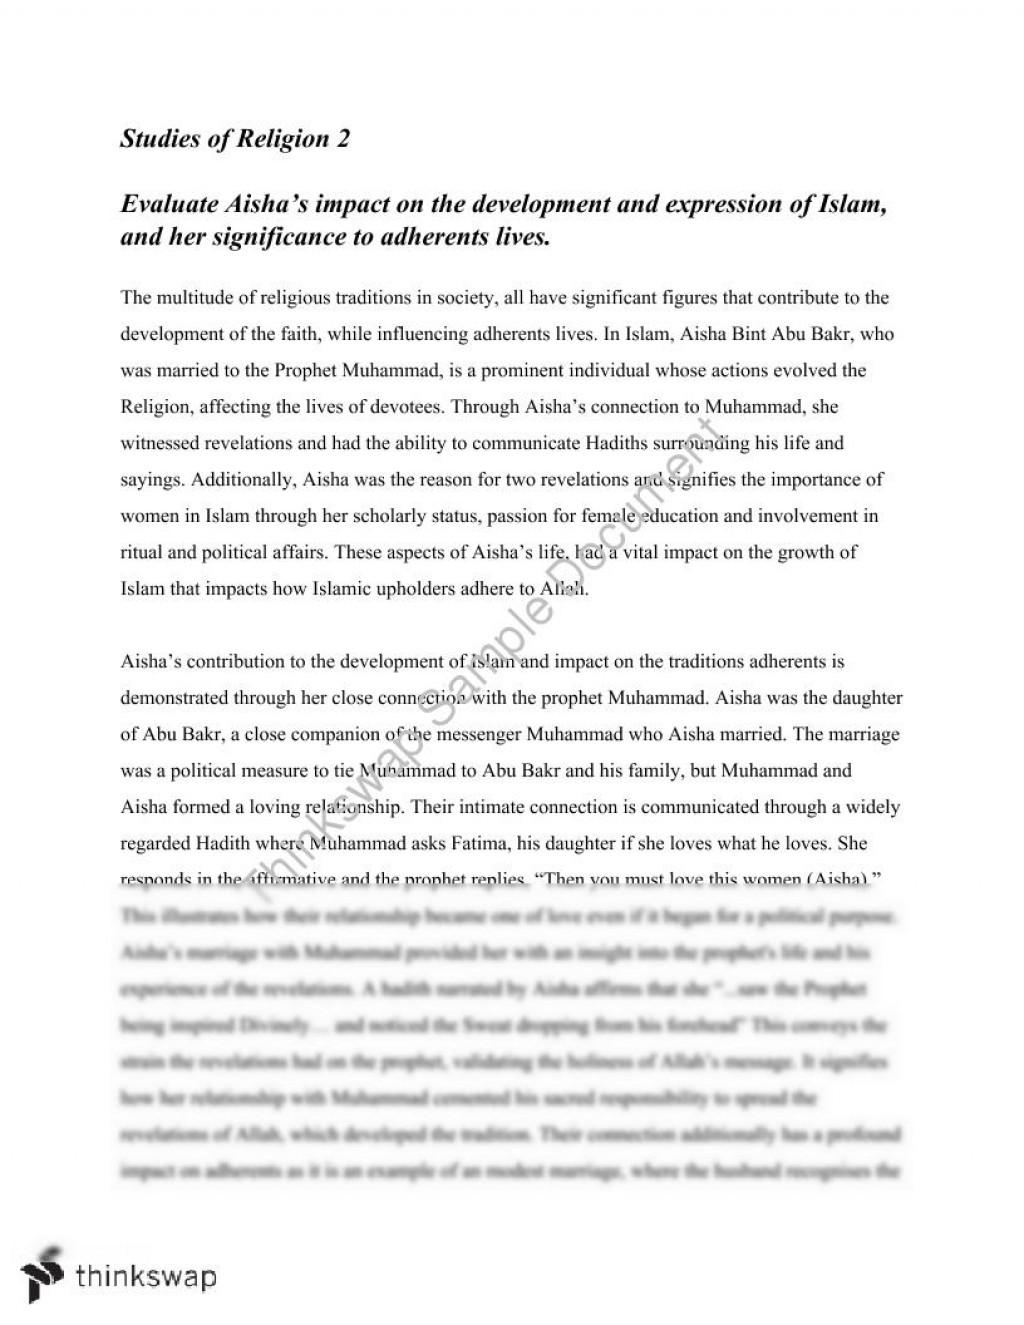 002 Essay On Islam Example 71449 Aisha Fadded41 Awful Persuasive Islamophobia My City Islamabad In Urdu Religion Hindi Large